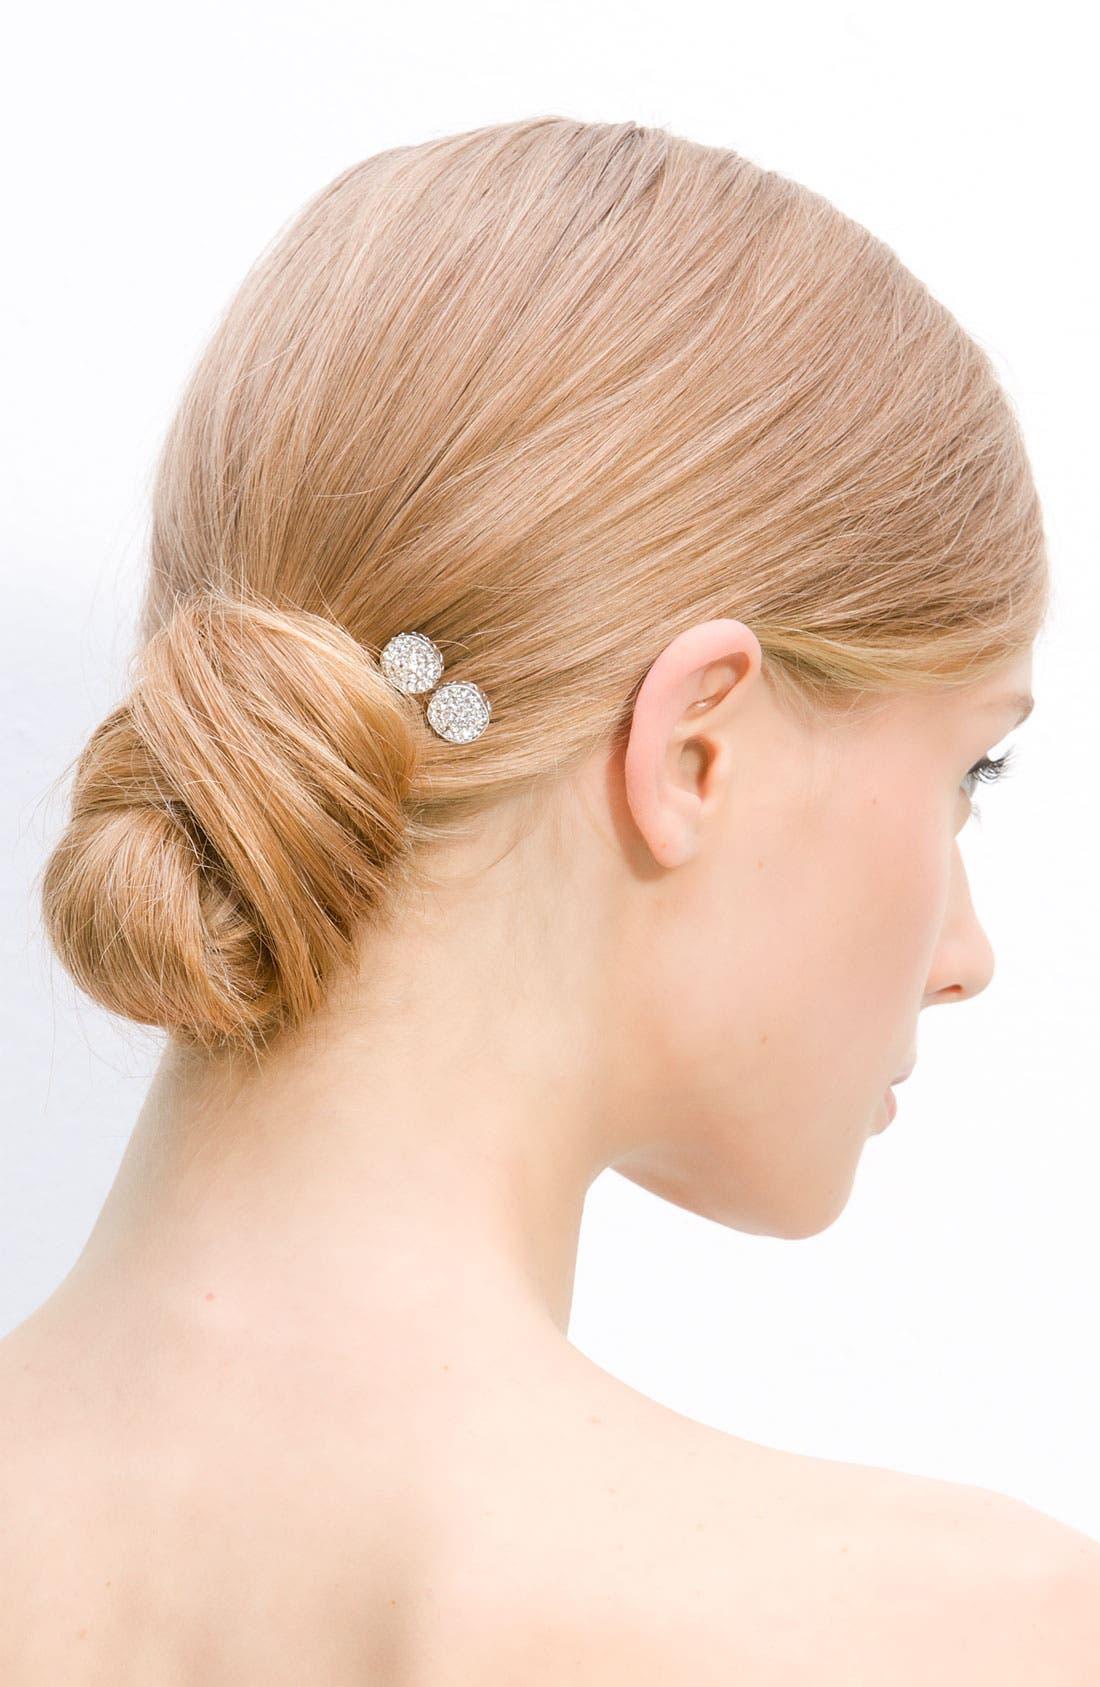 Alternate Image 1 Selected - Tasha 'Mini Circle' Hair Picks (Set of 2)